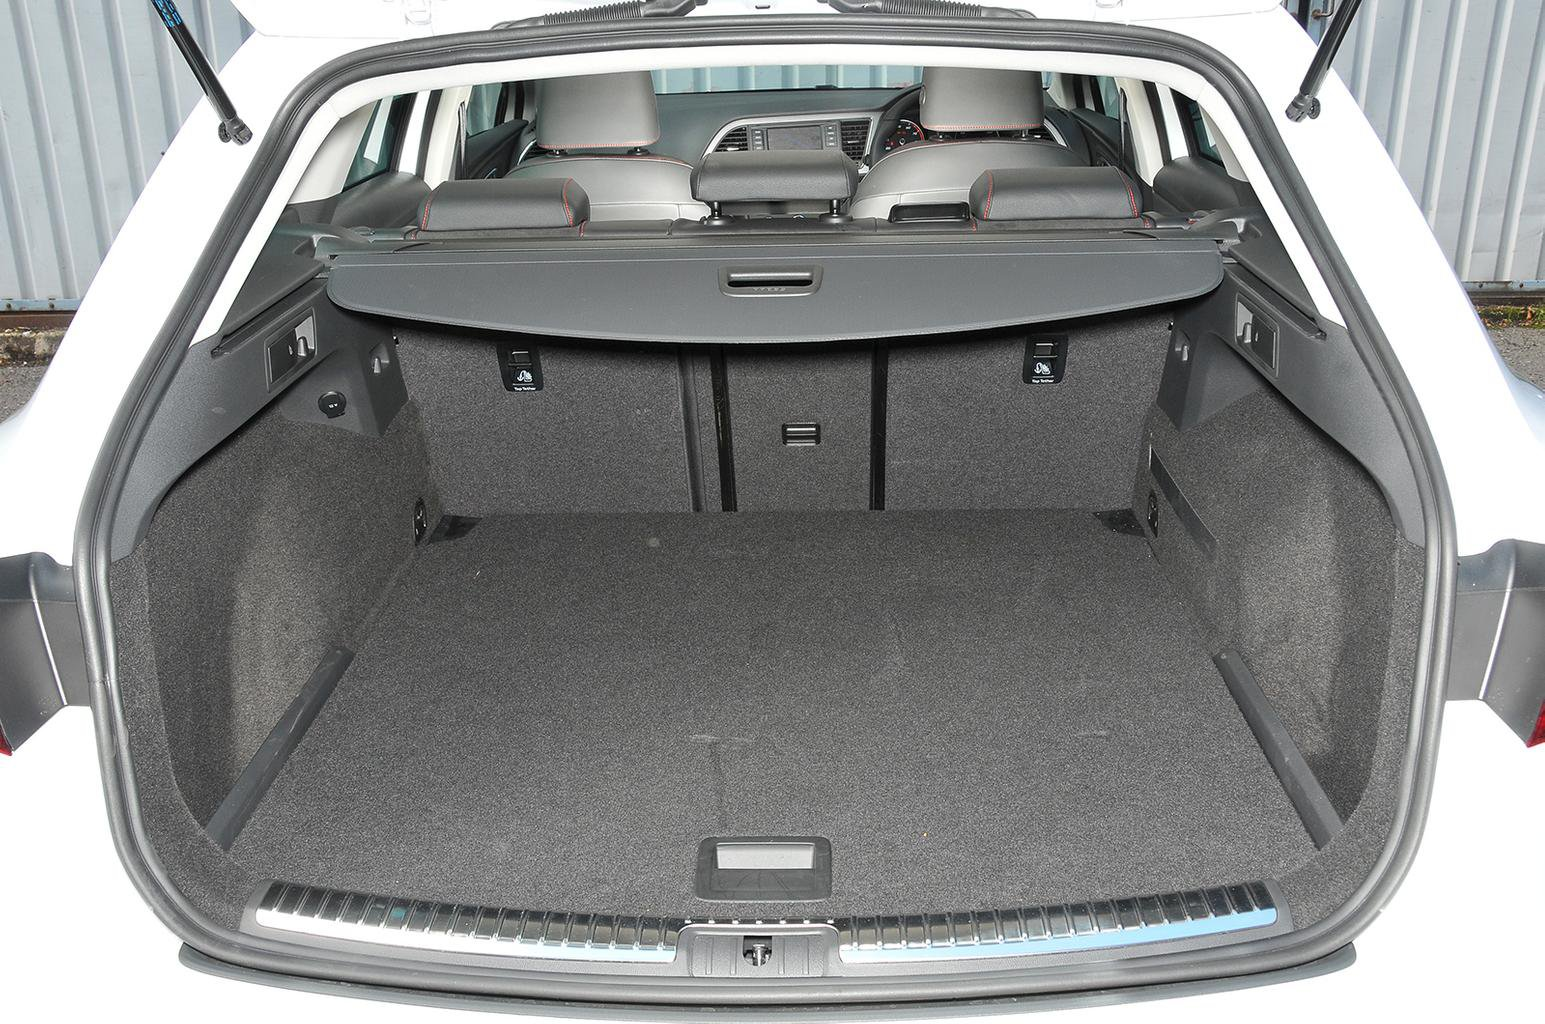 Used Seat Leon ST 13-present